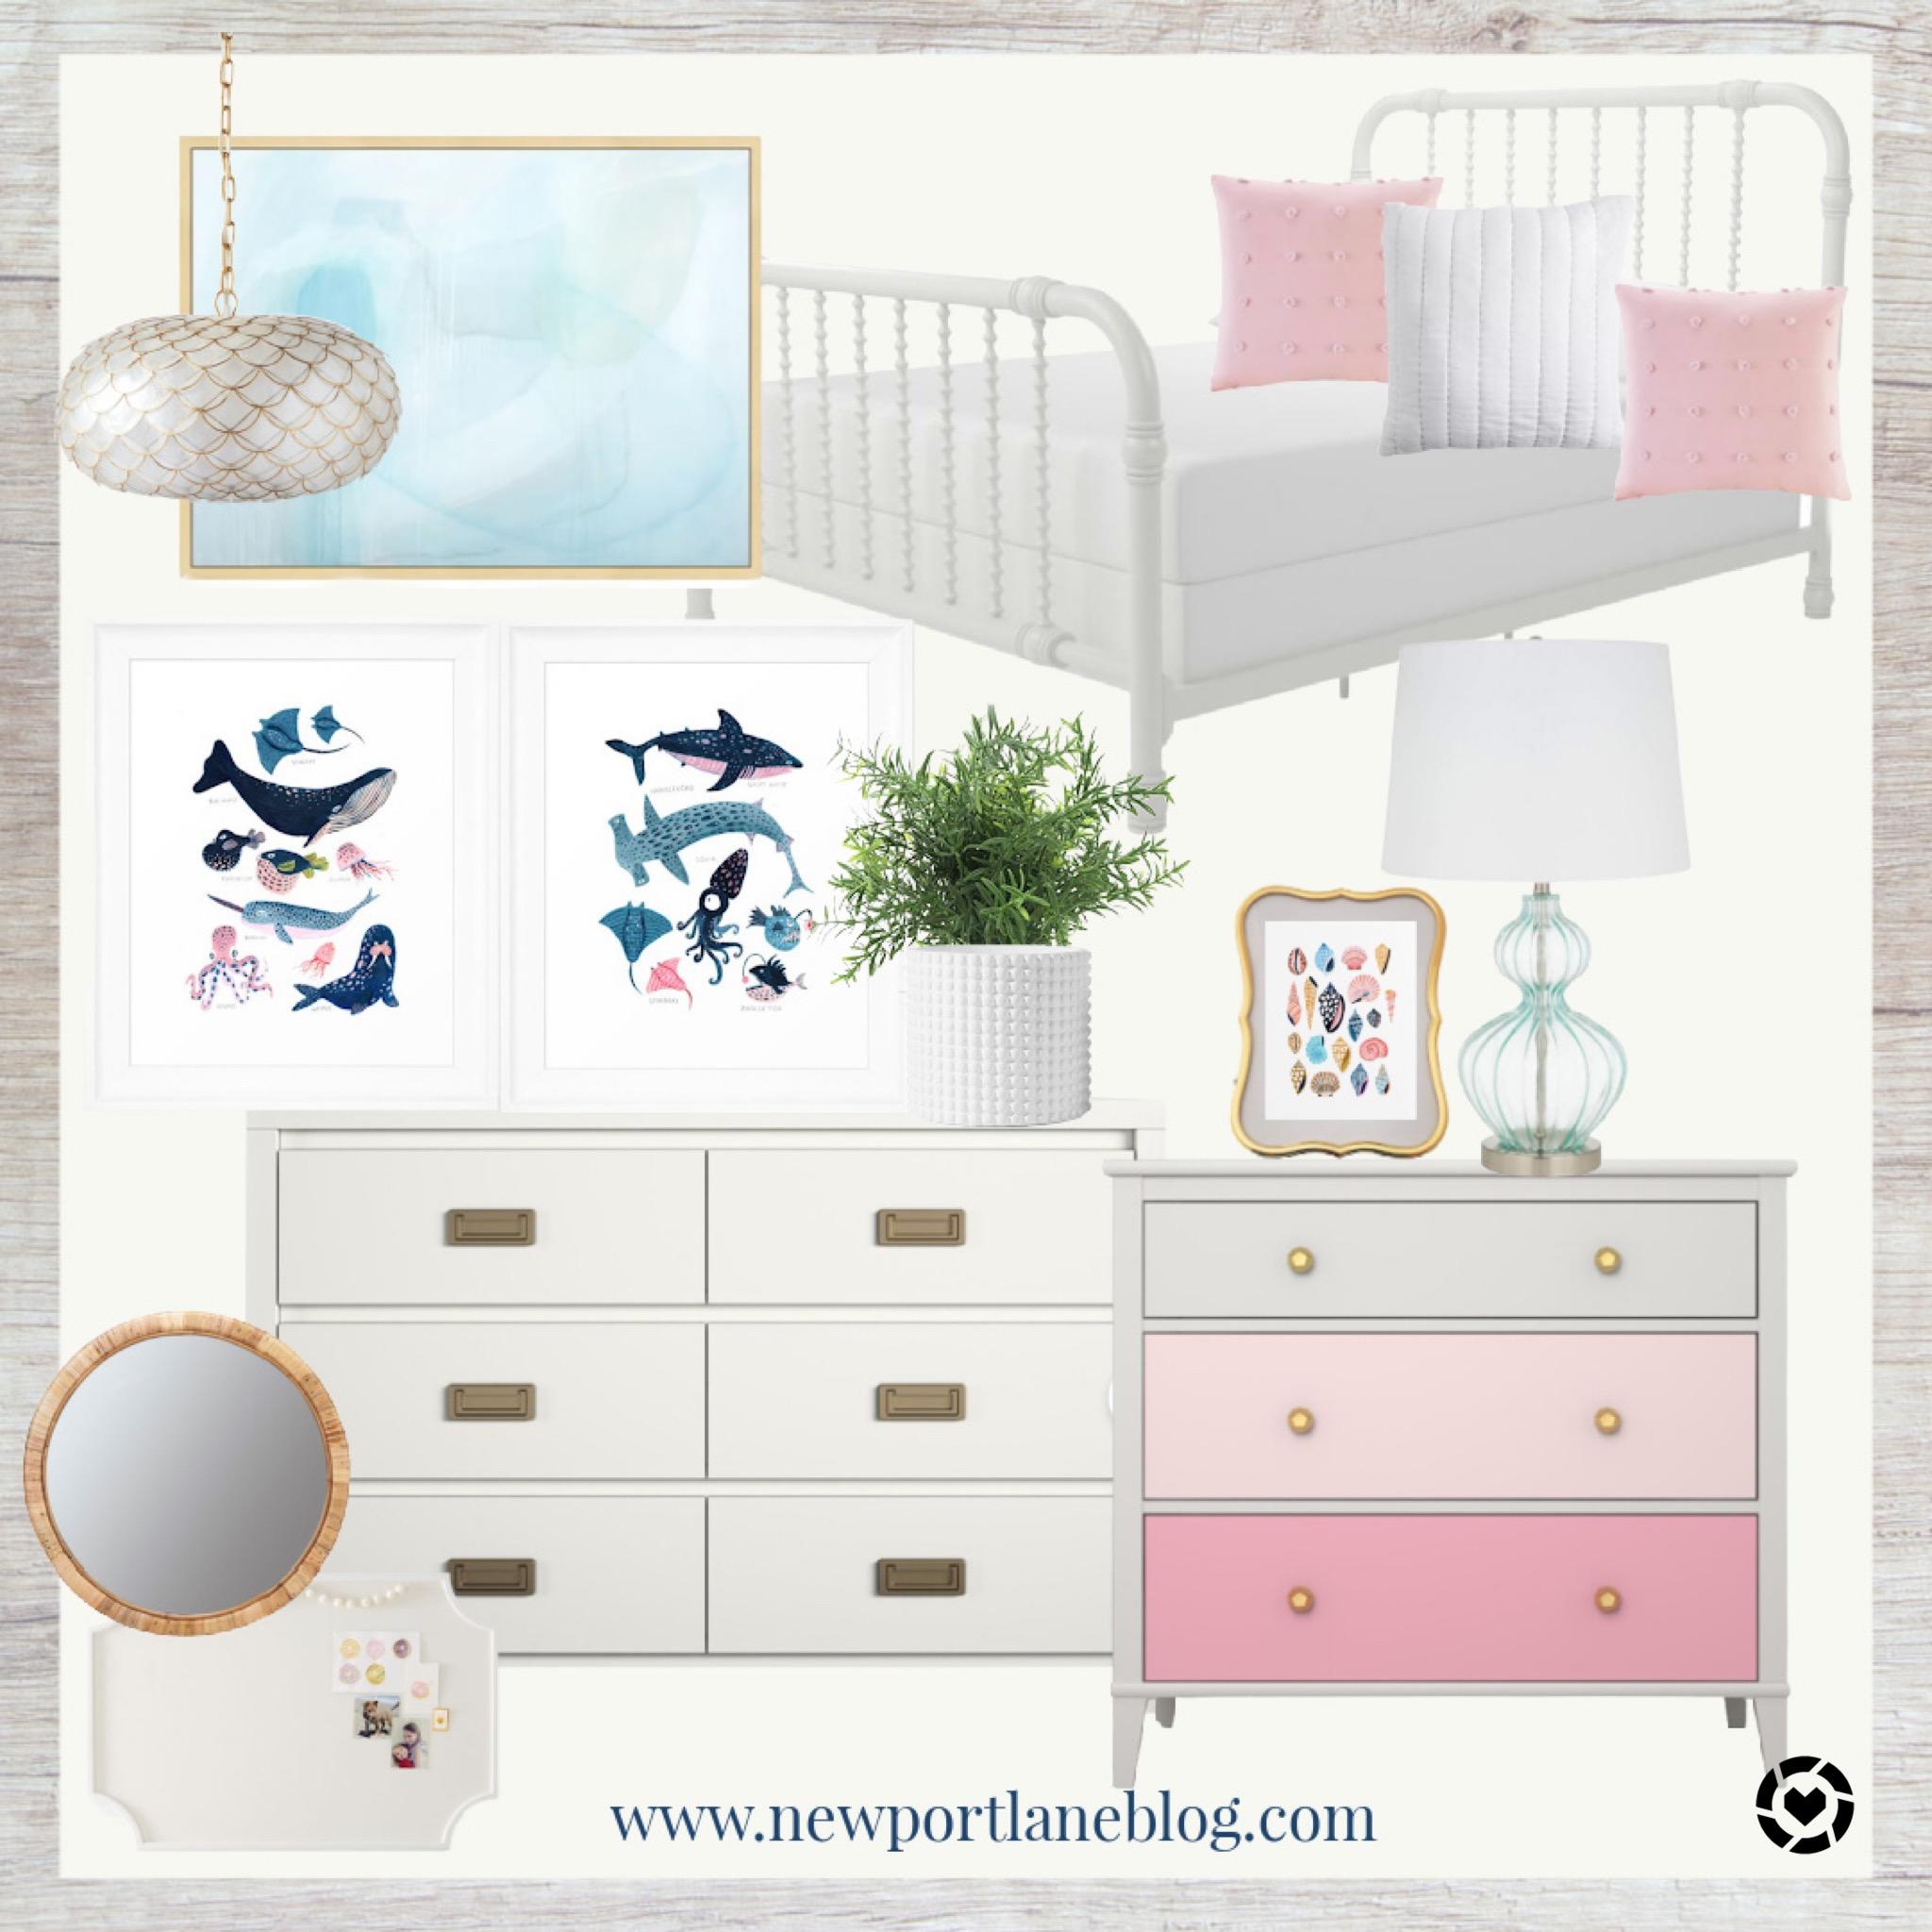 Beach Themed Bedroom for Girls   Coastal Girls Bedroom   Pink and Turquoise Bedroom Ideas   Pink and Turquoise Room Decor   Beach House Bedroom